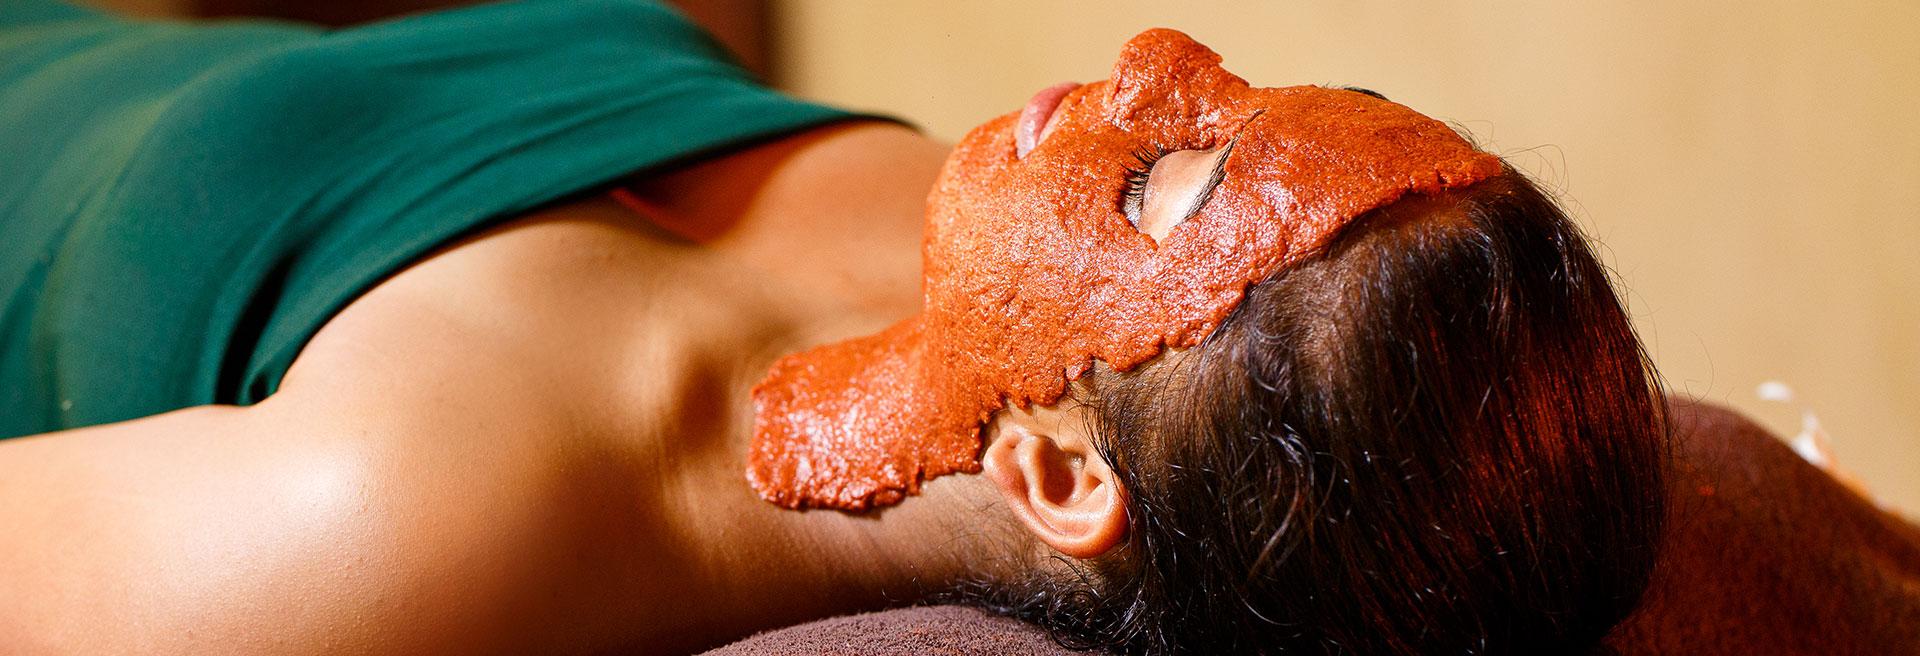 Relaxing facial massage